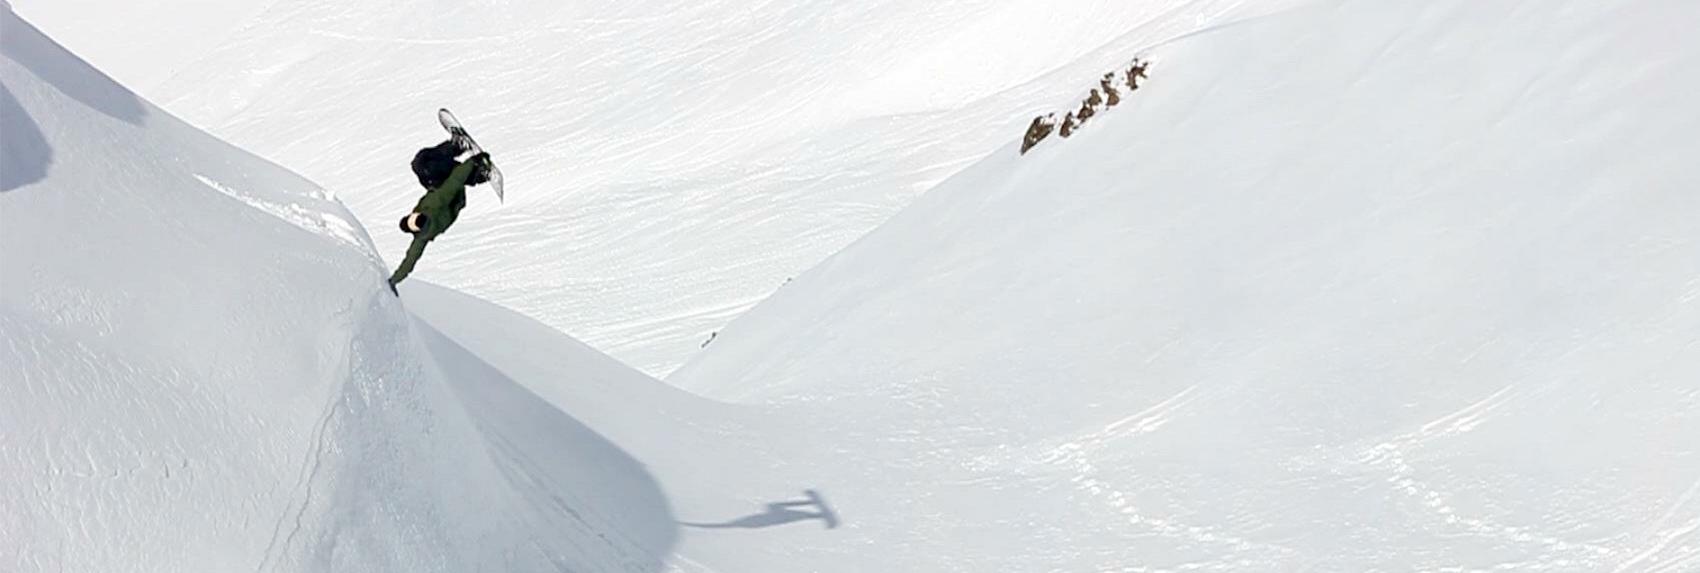 safe_formacion-tecnico_deportivo_nivel_2-snowboard-les_deux_alpes-verano2018-slider